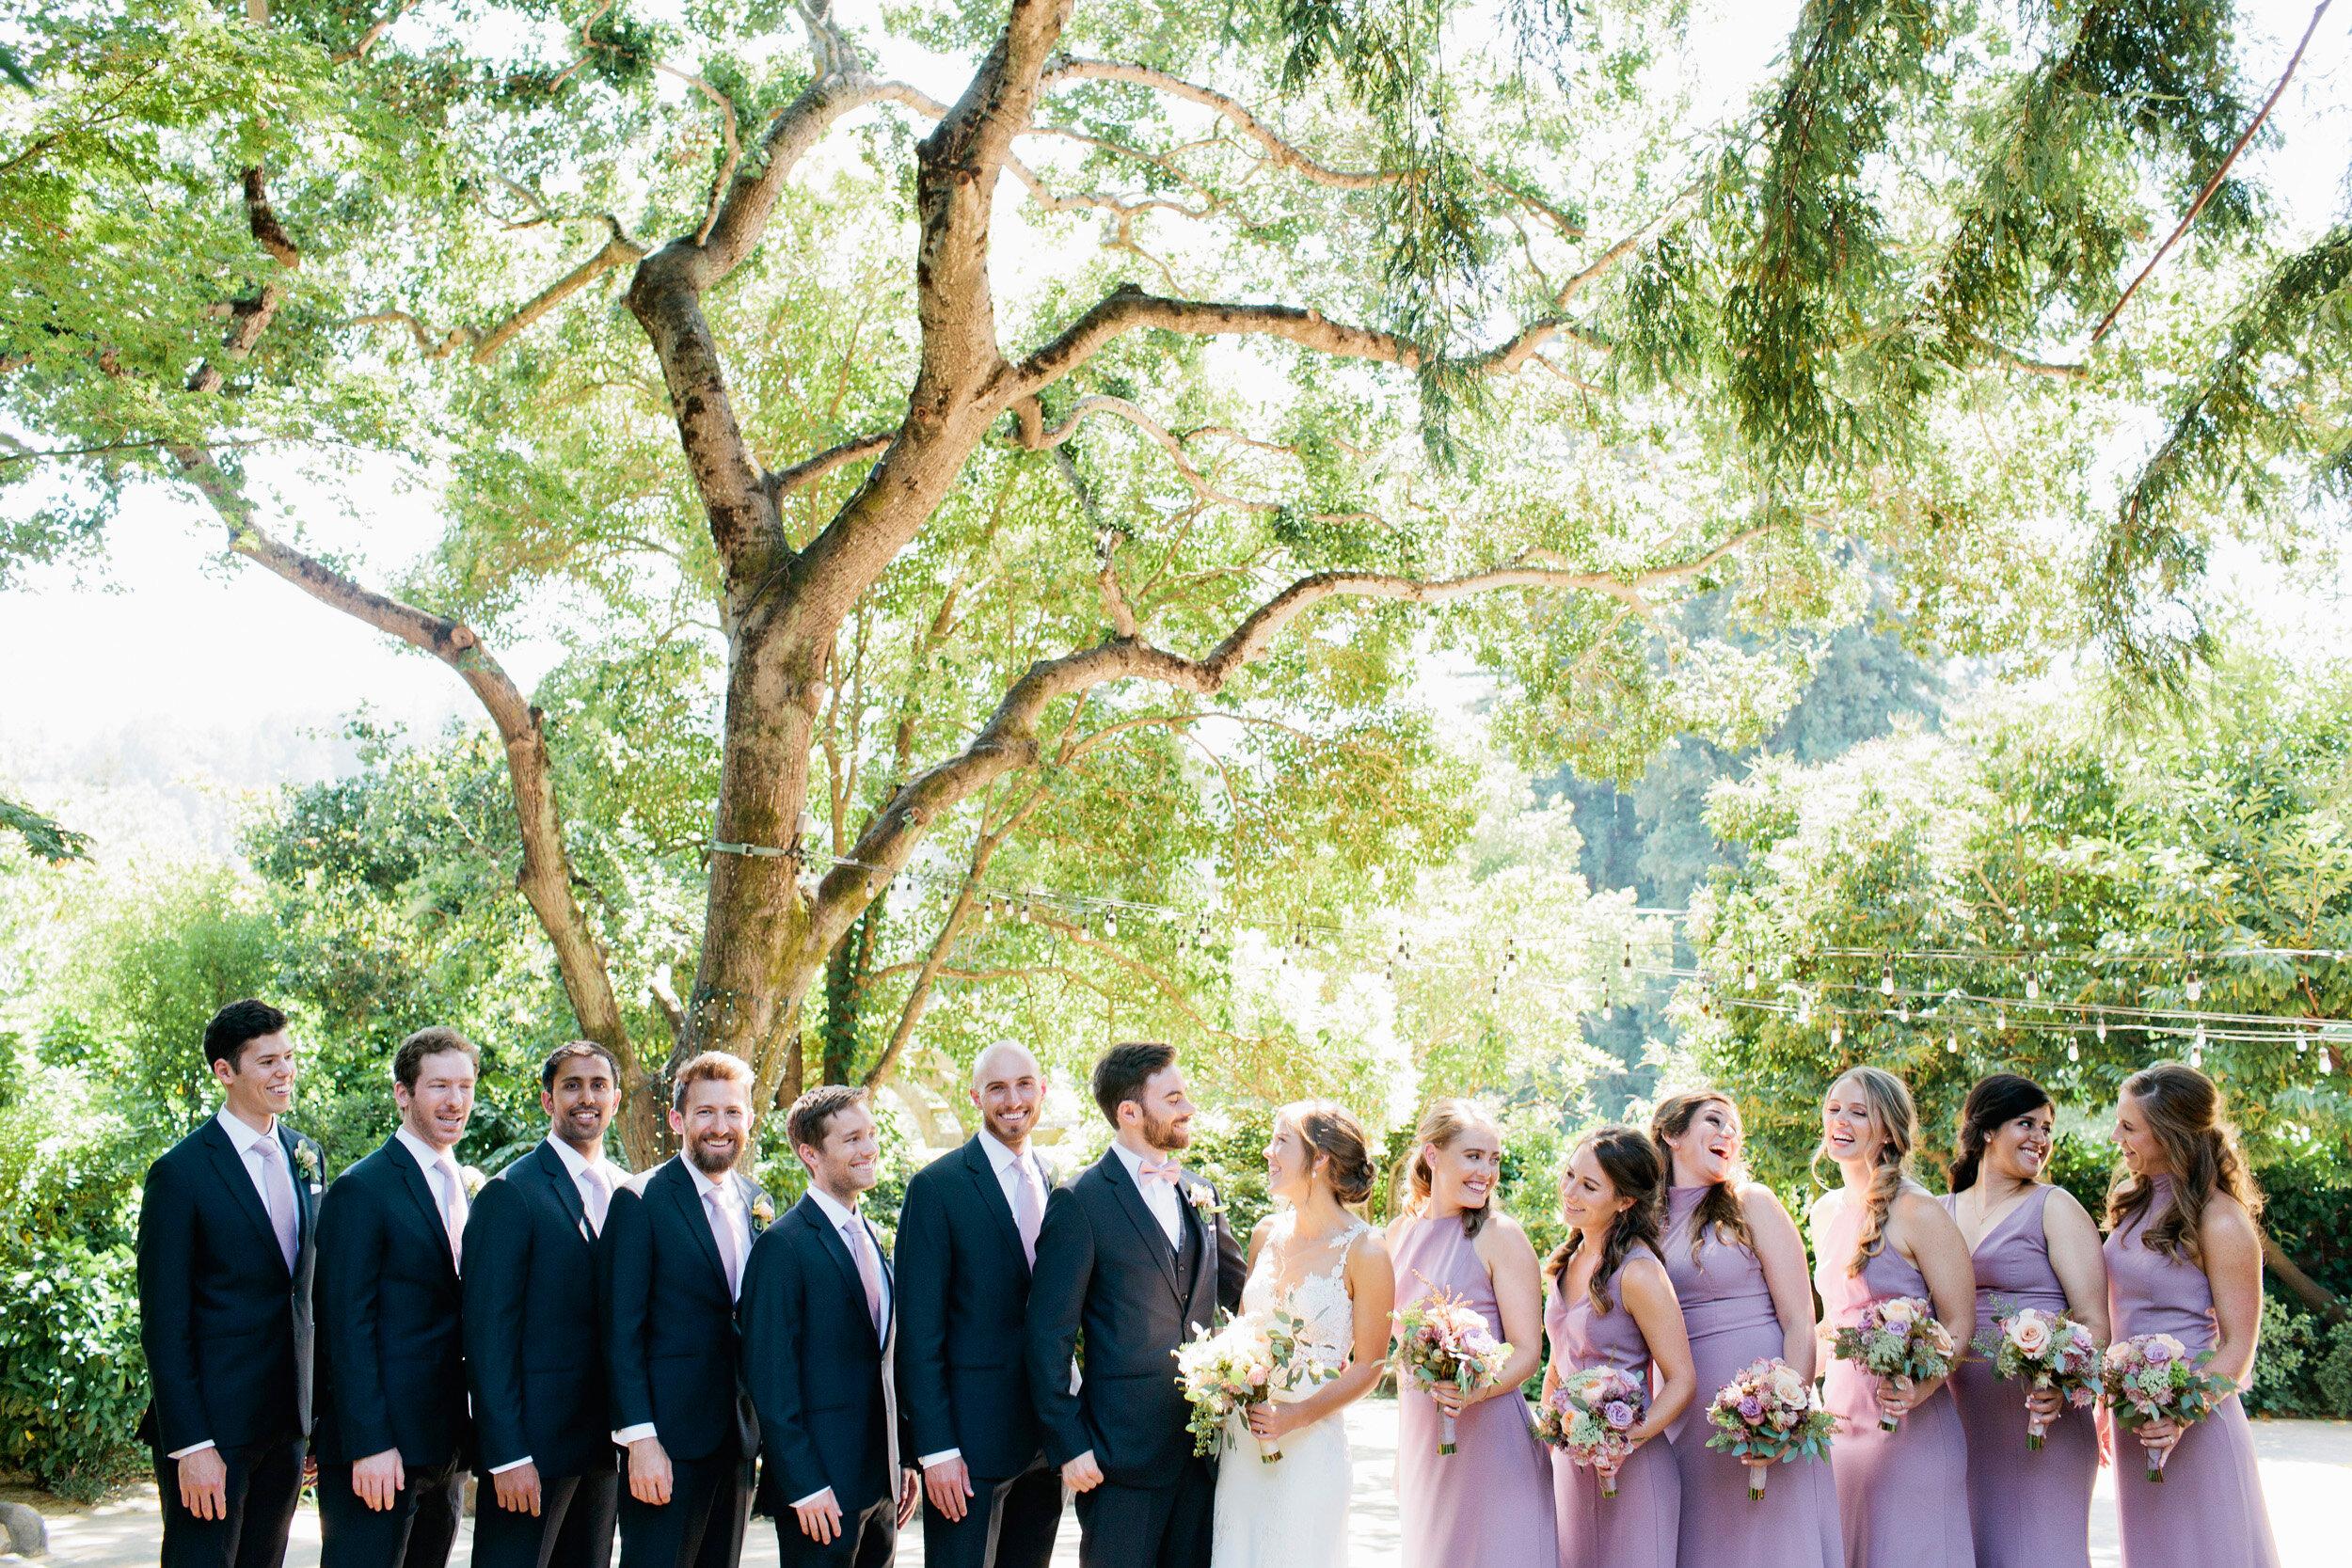 Marin-Art-Garden-Center-Wedding-22.JPG